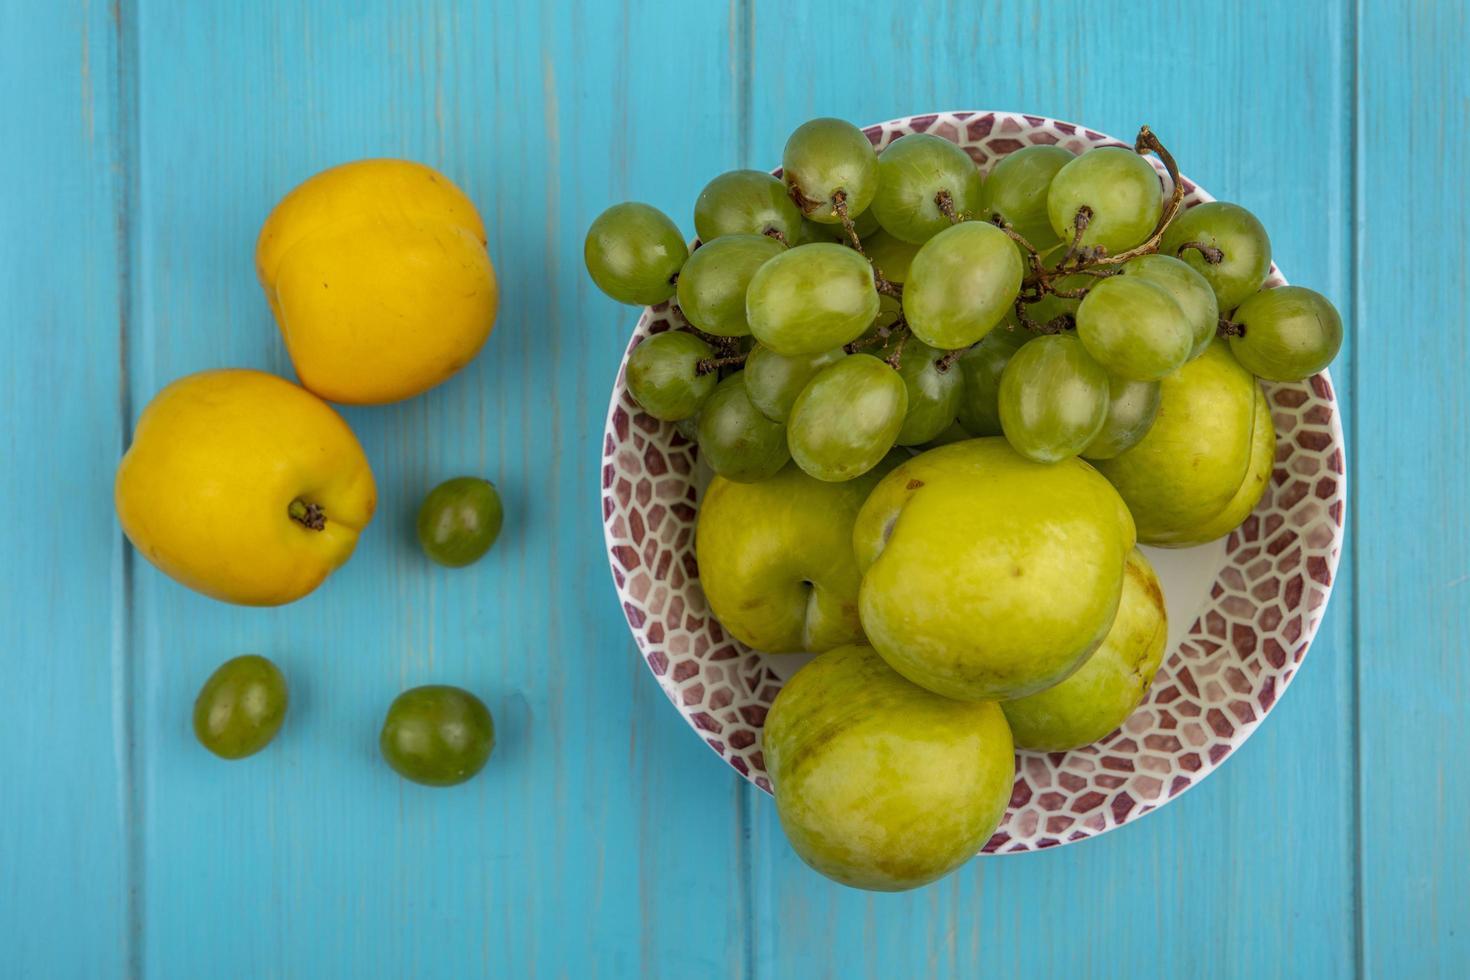 Assorted fruit on blue background photo